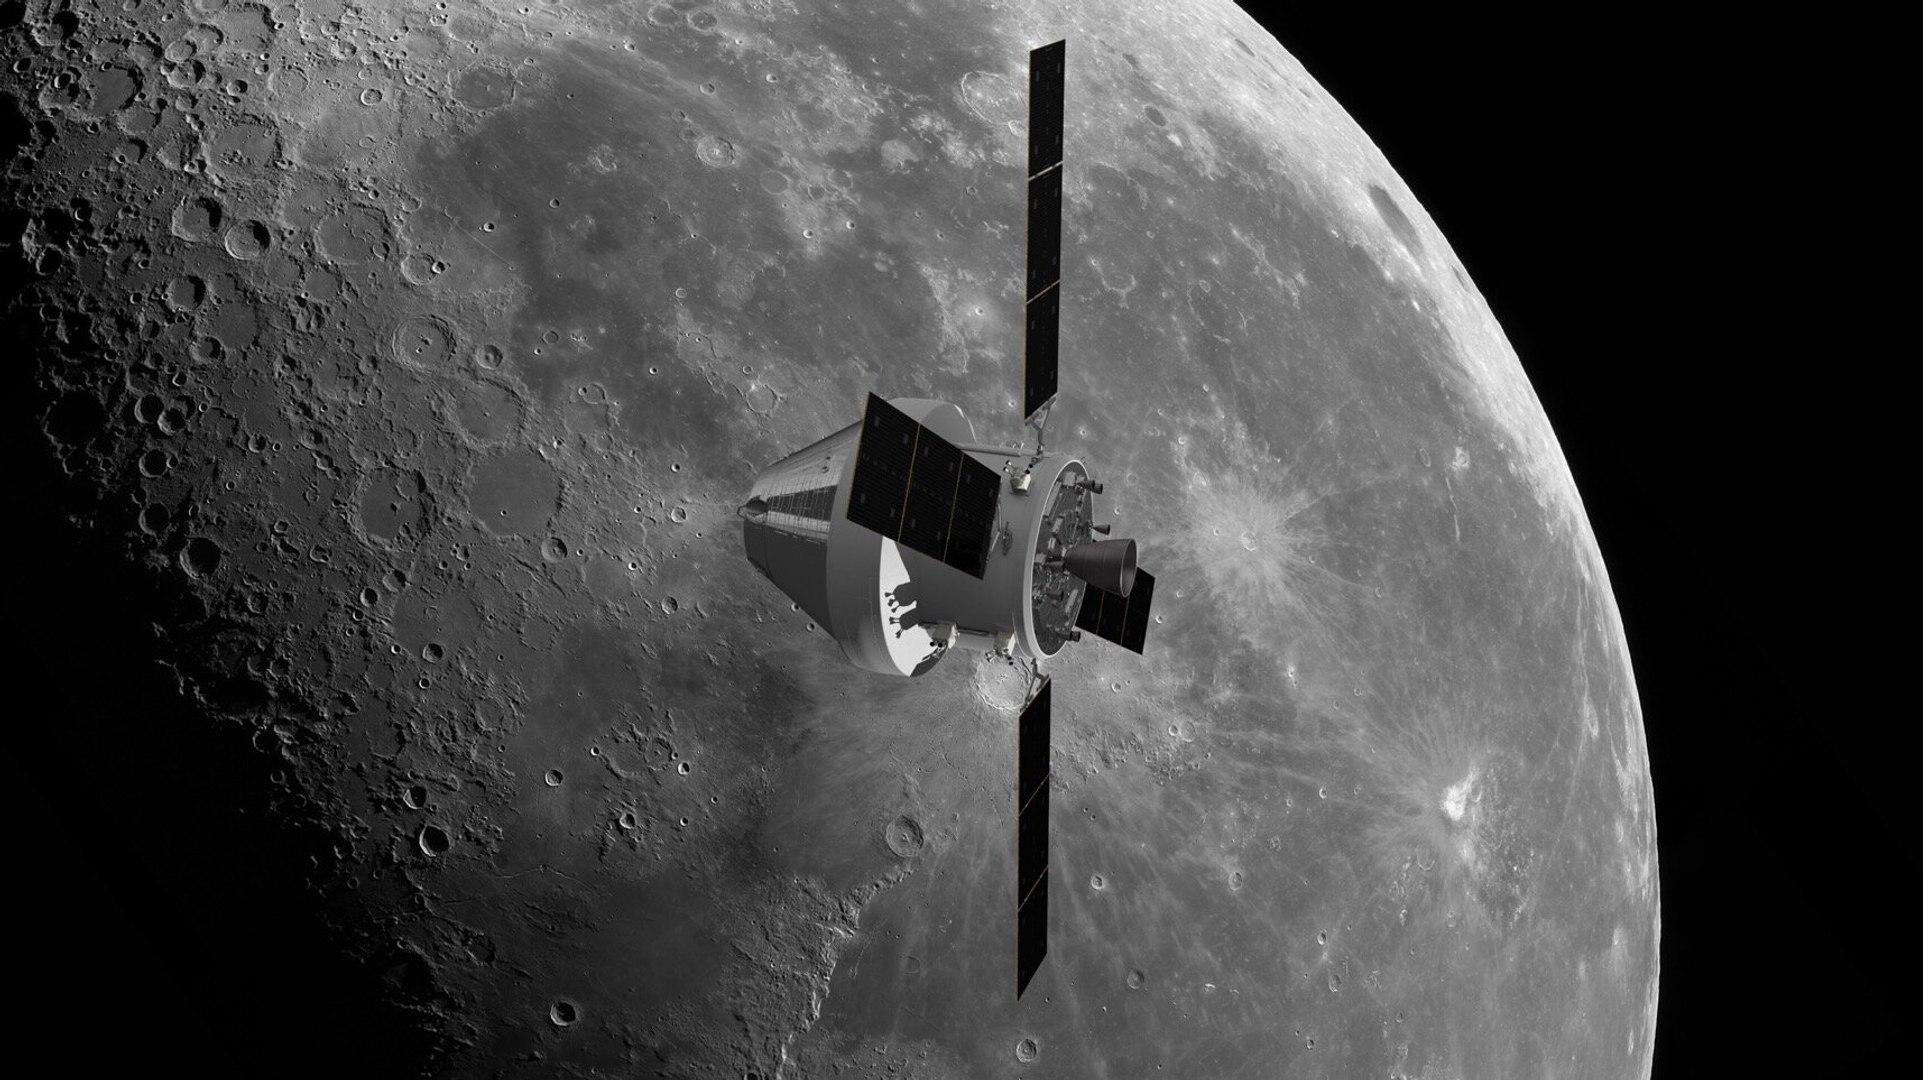 Chandrayaan-2 Inches Closer Towards Moon's South Pole